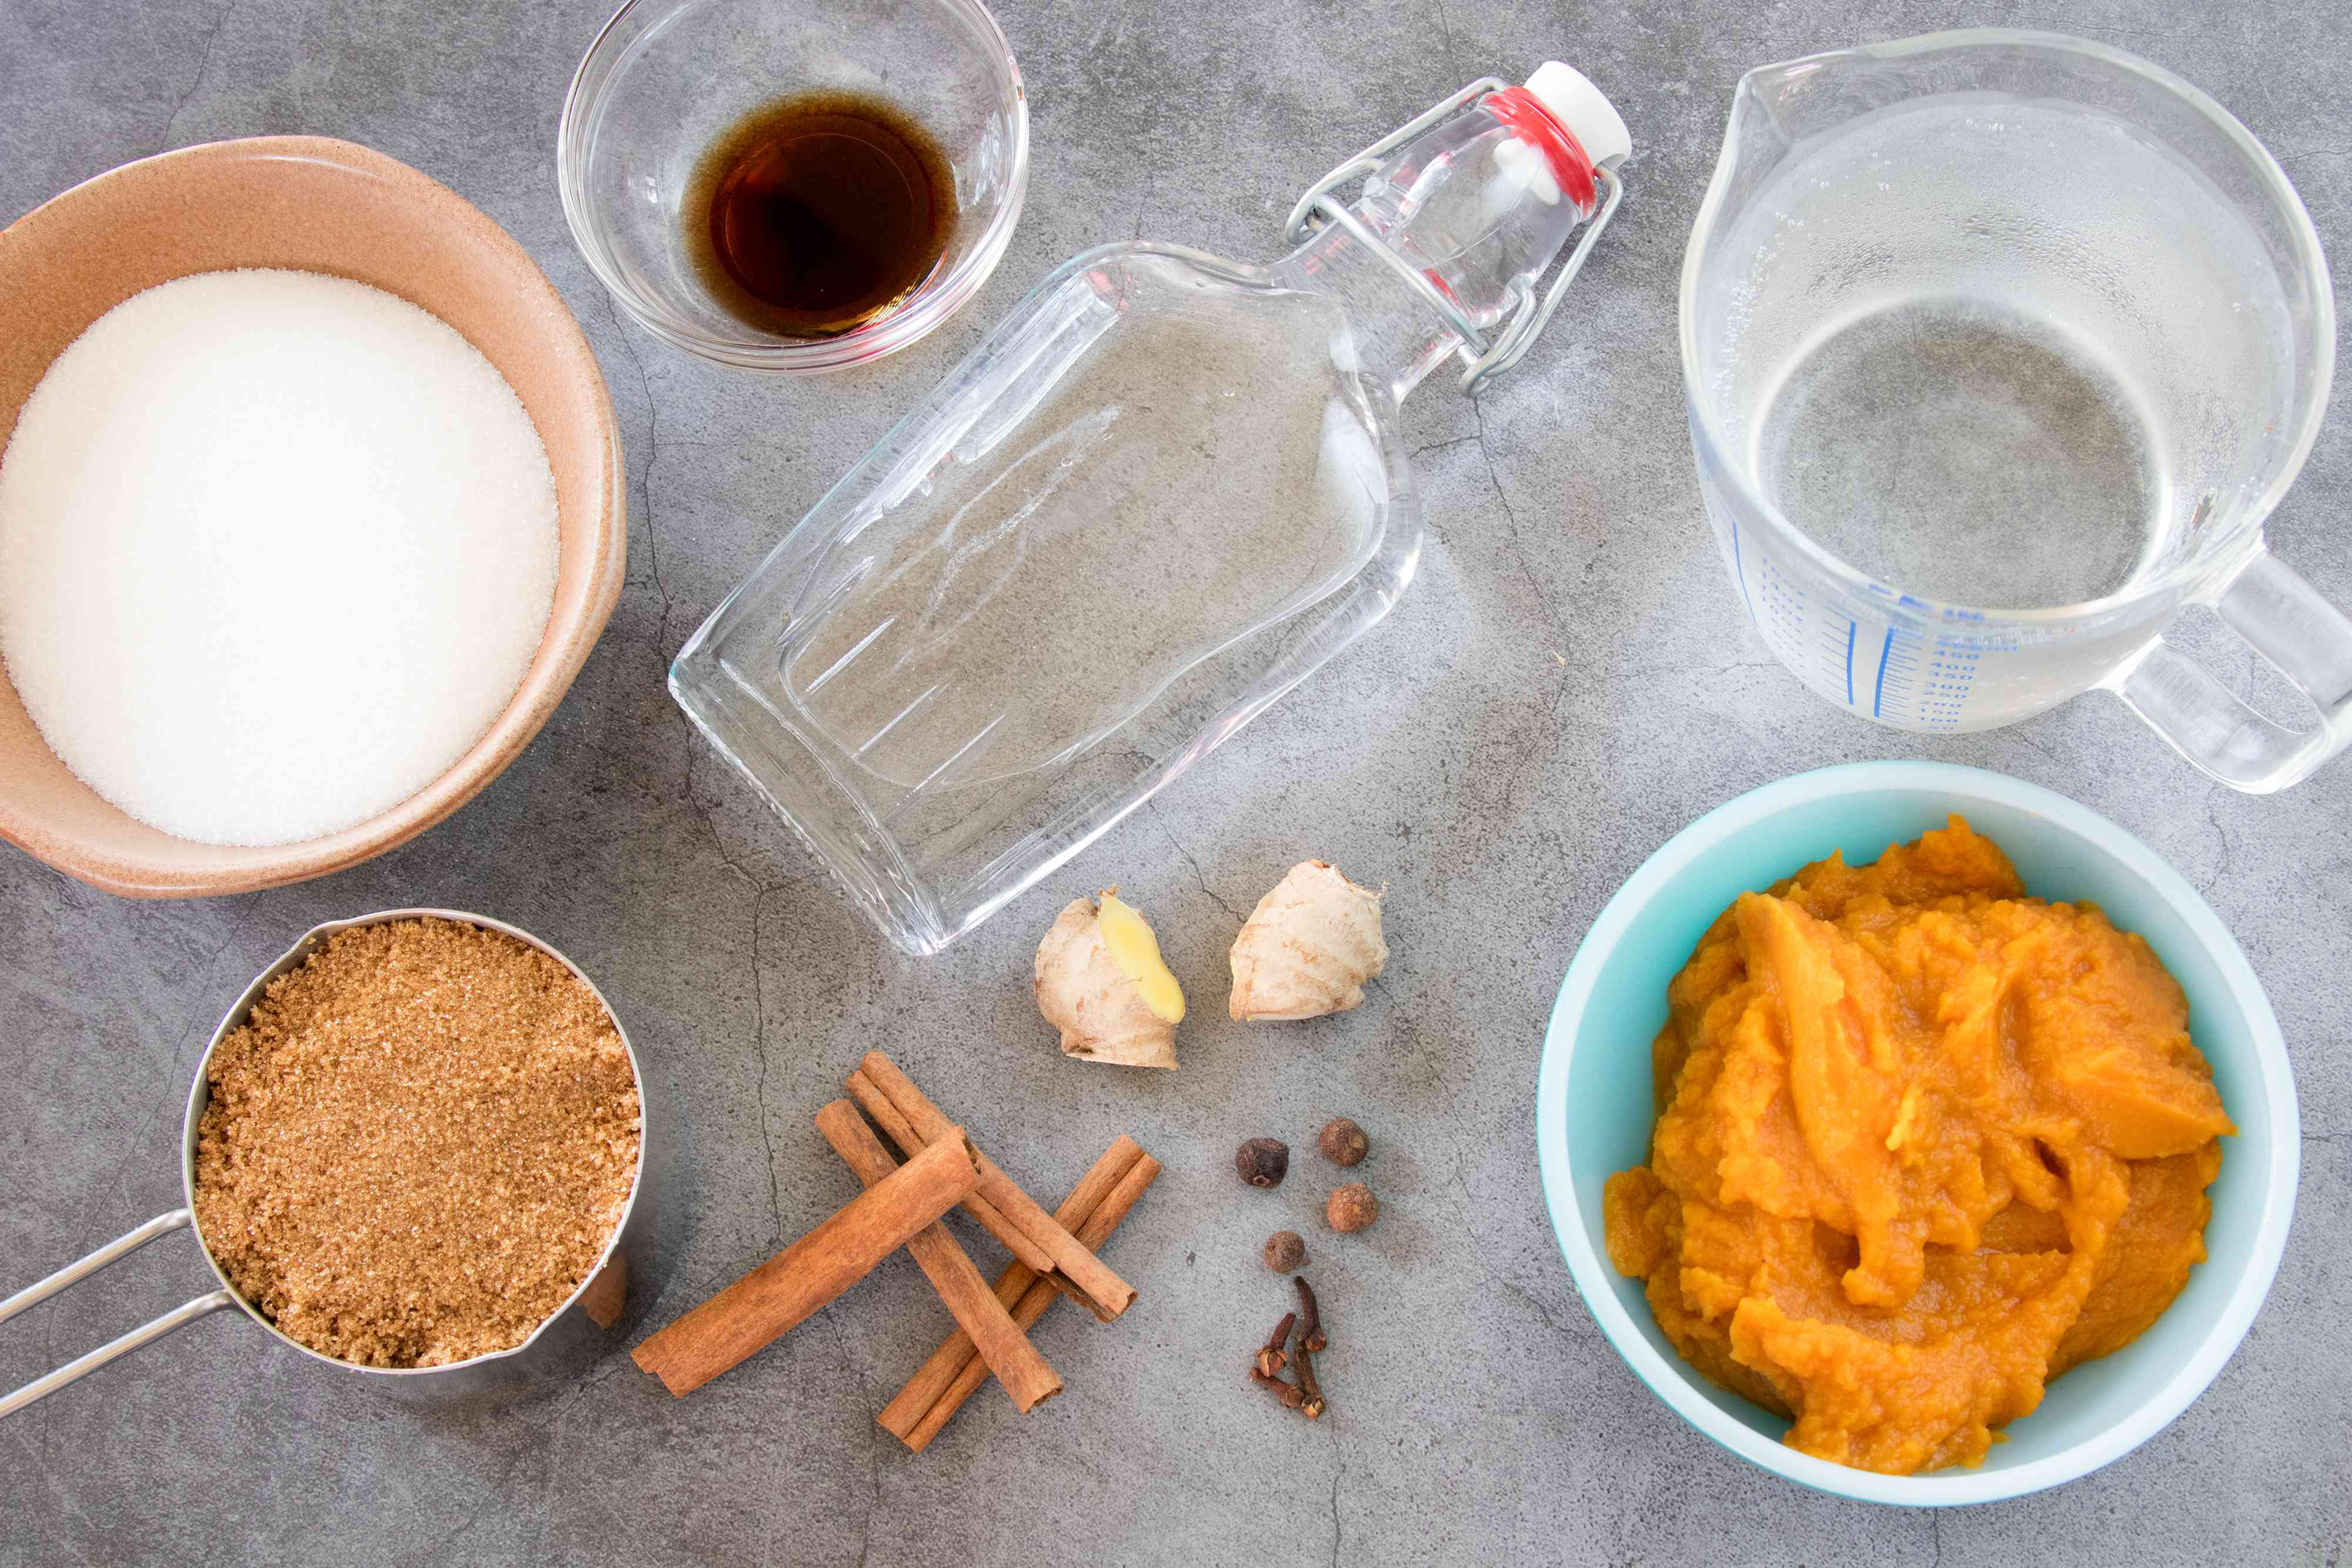 Ingredients for Homemade Pumpkin Liqueur